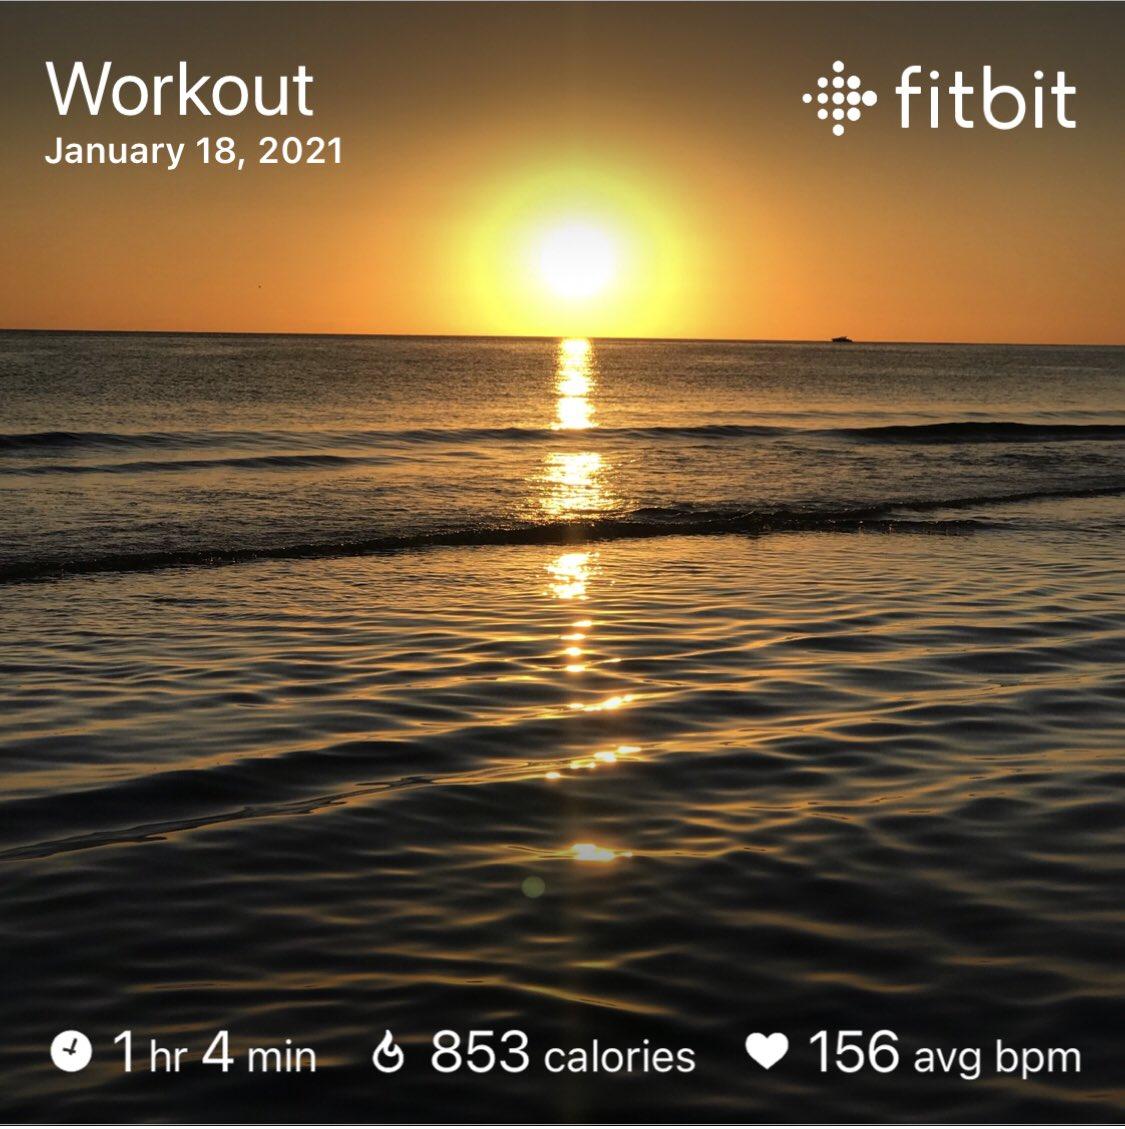 #fitness #motivation #fitnessjourney #lifestylechange #feelinggood #fitnessgoals #fitbit